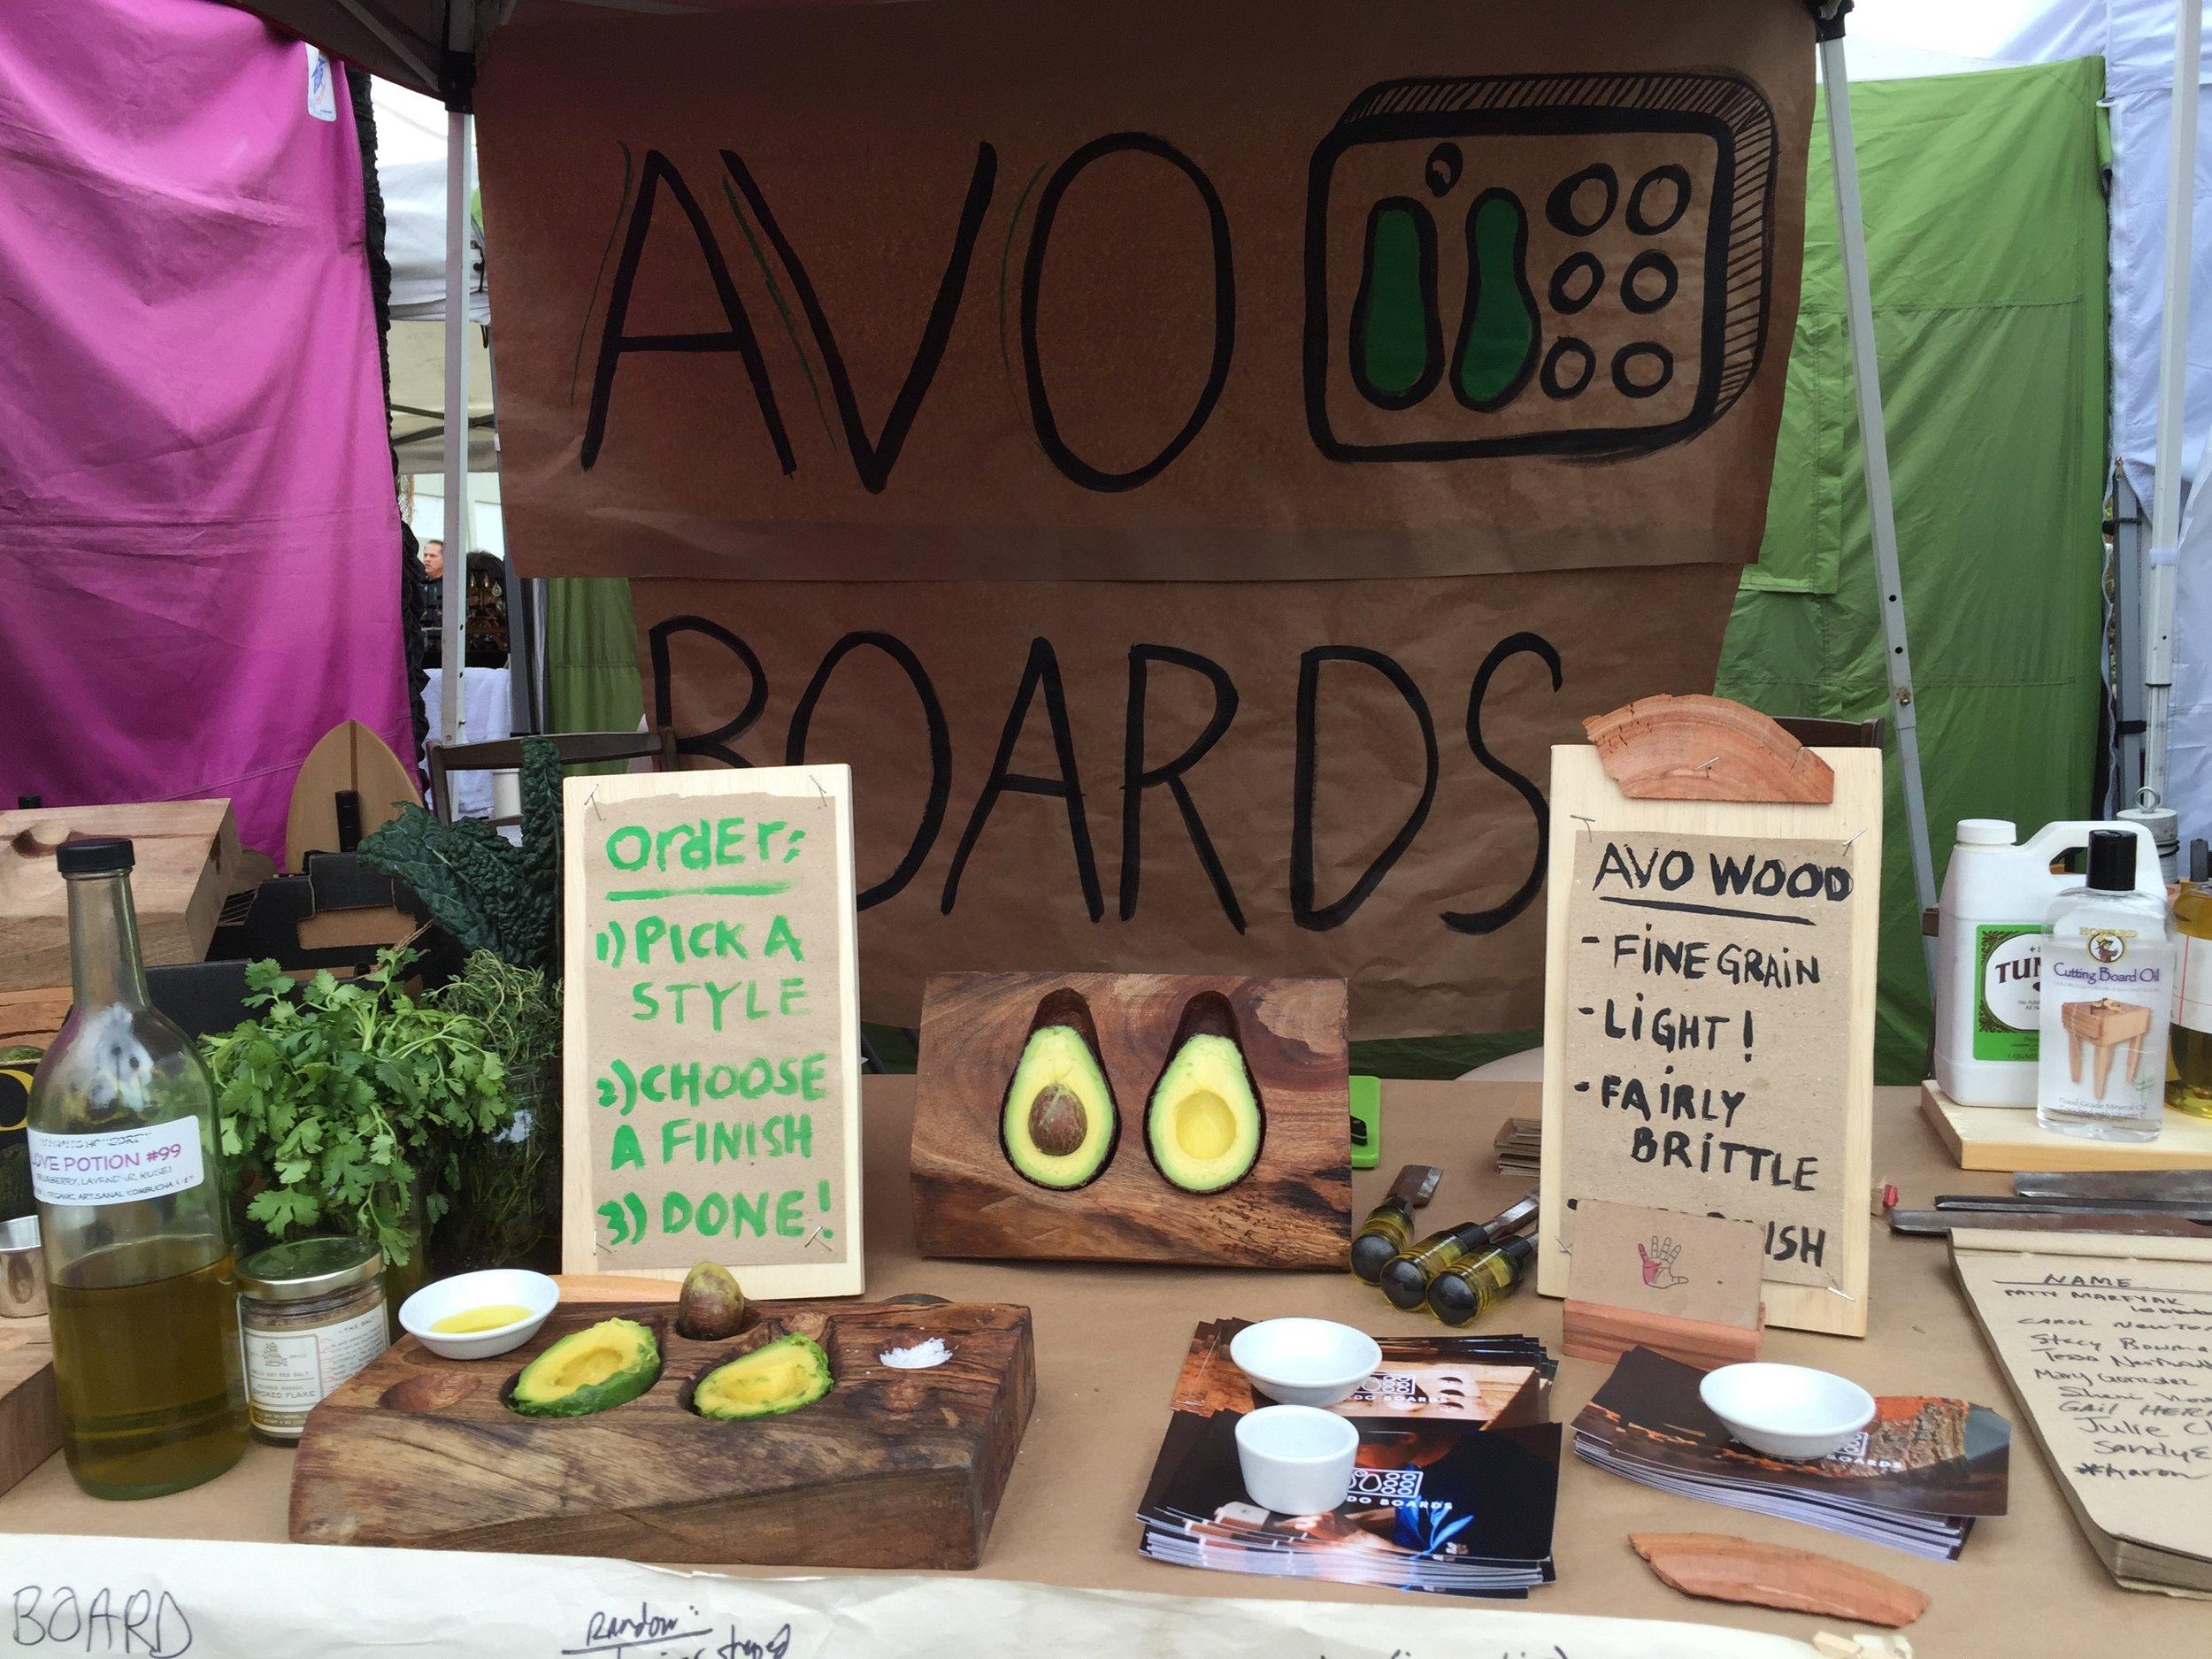 California avocado festival -